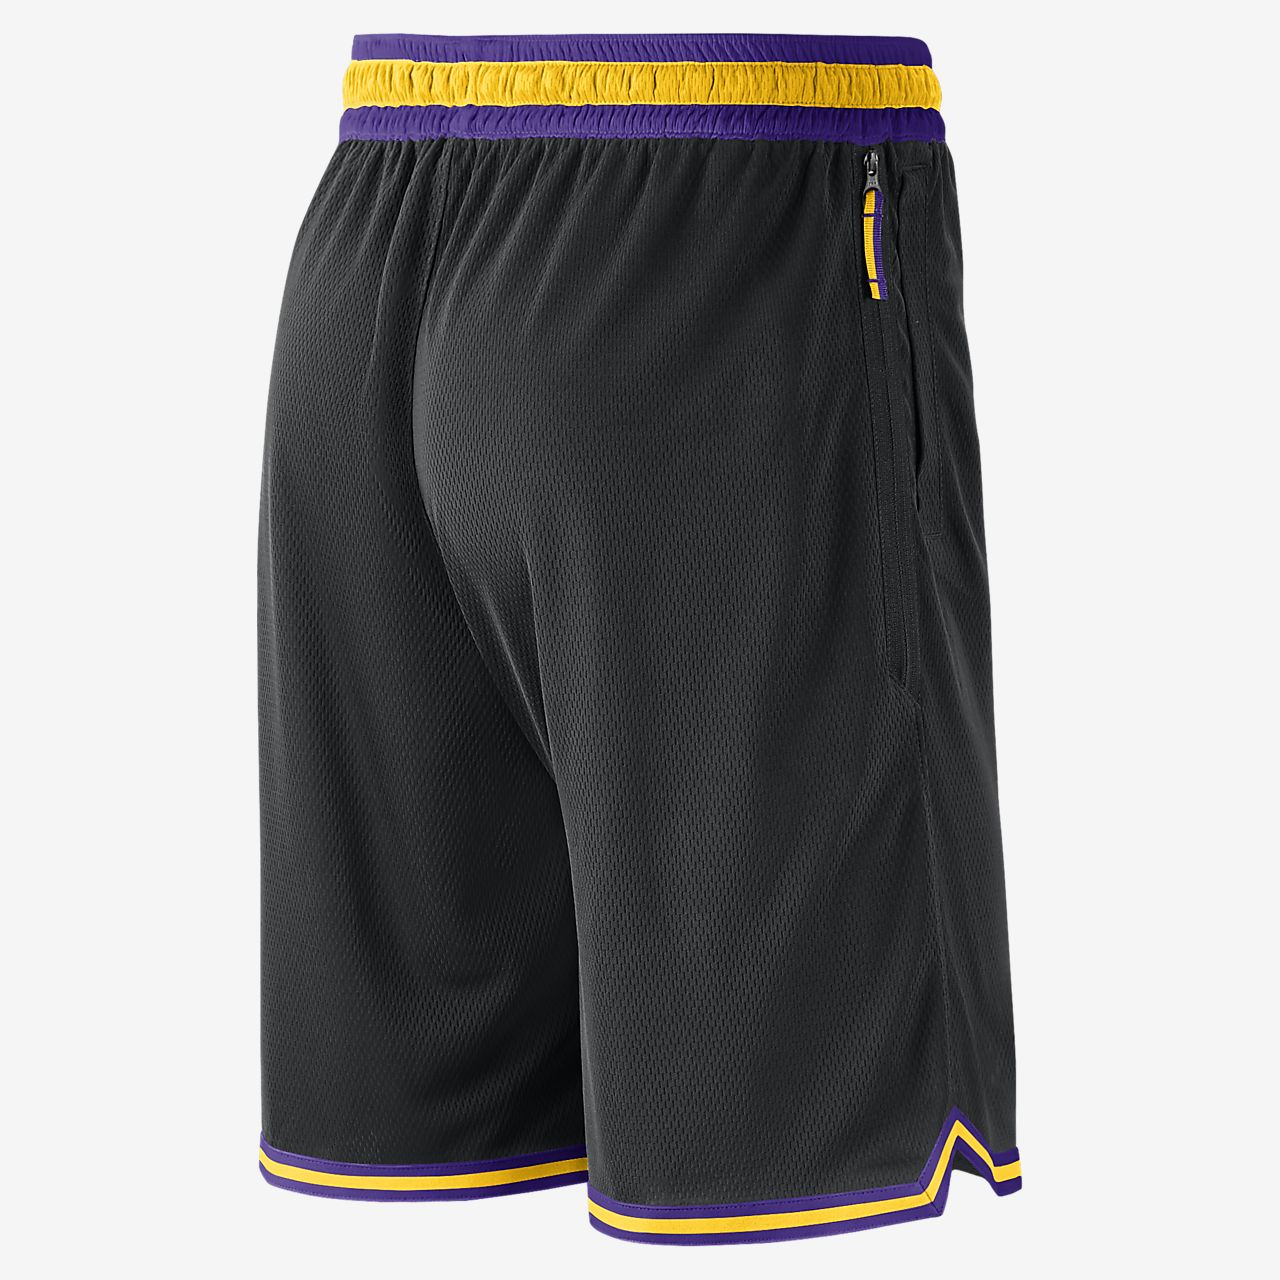 Brand New Los Angeles LA Lakers Basketball Shorts USA Seller